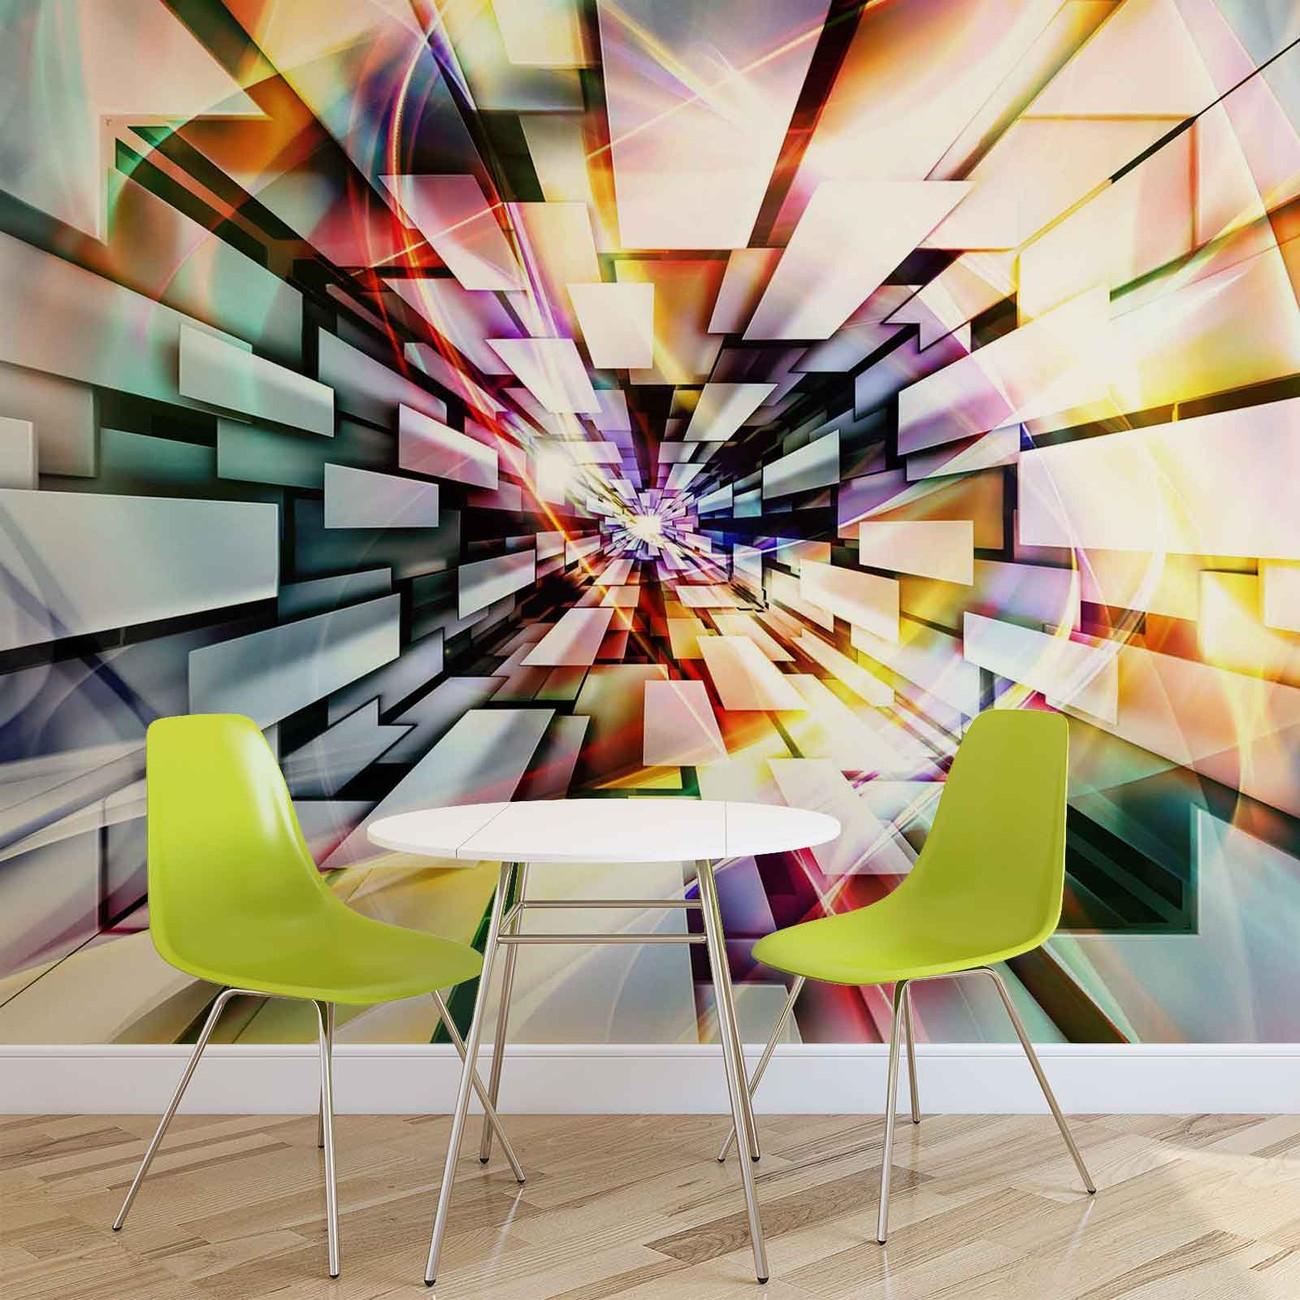 fototapete tapete muster abstrakt bunt bei europosters. Black Bedroom Furniture Sets. Home Design Ideas